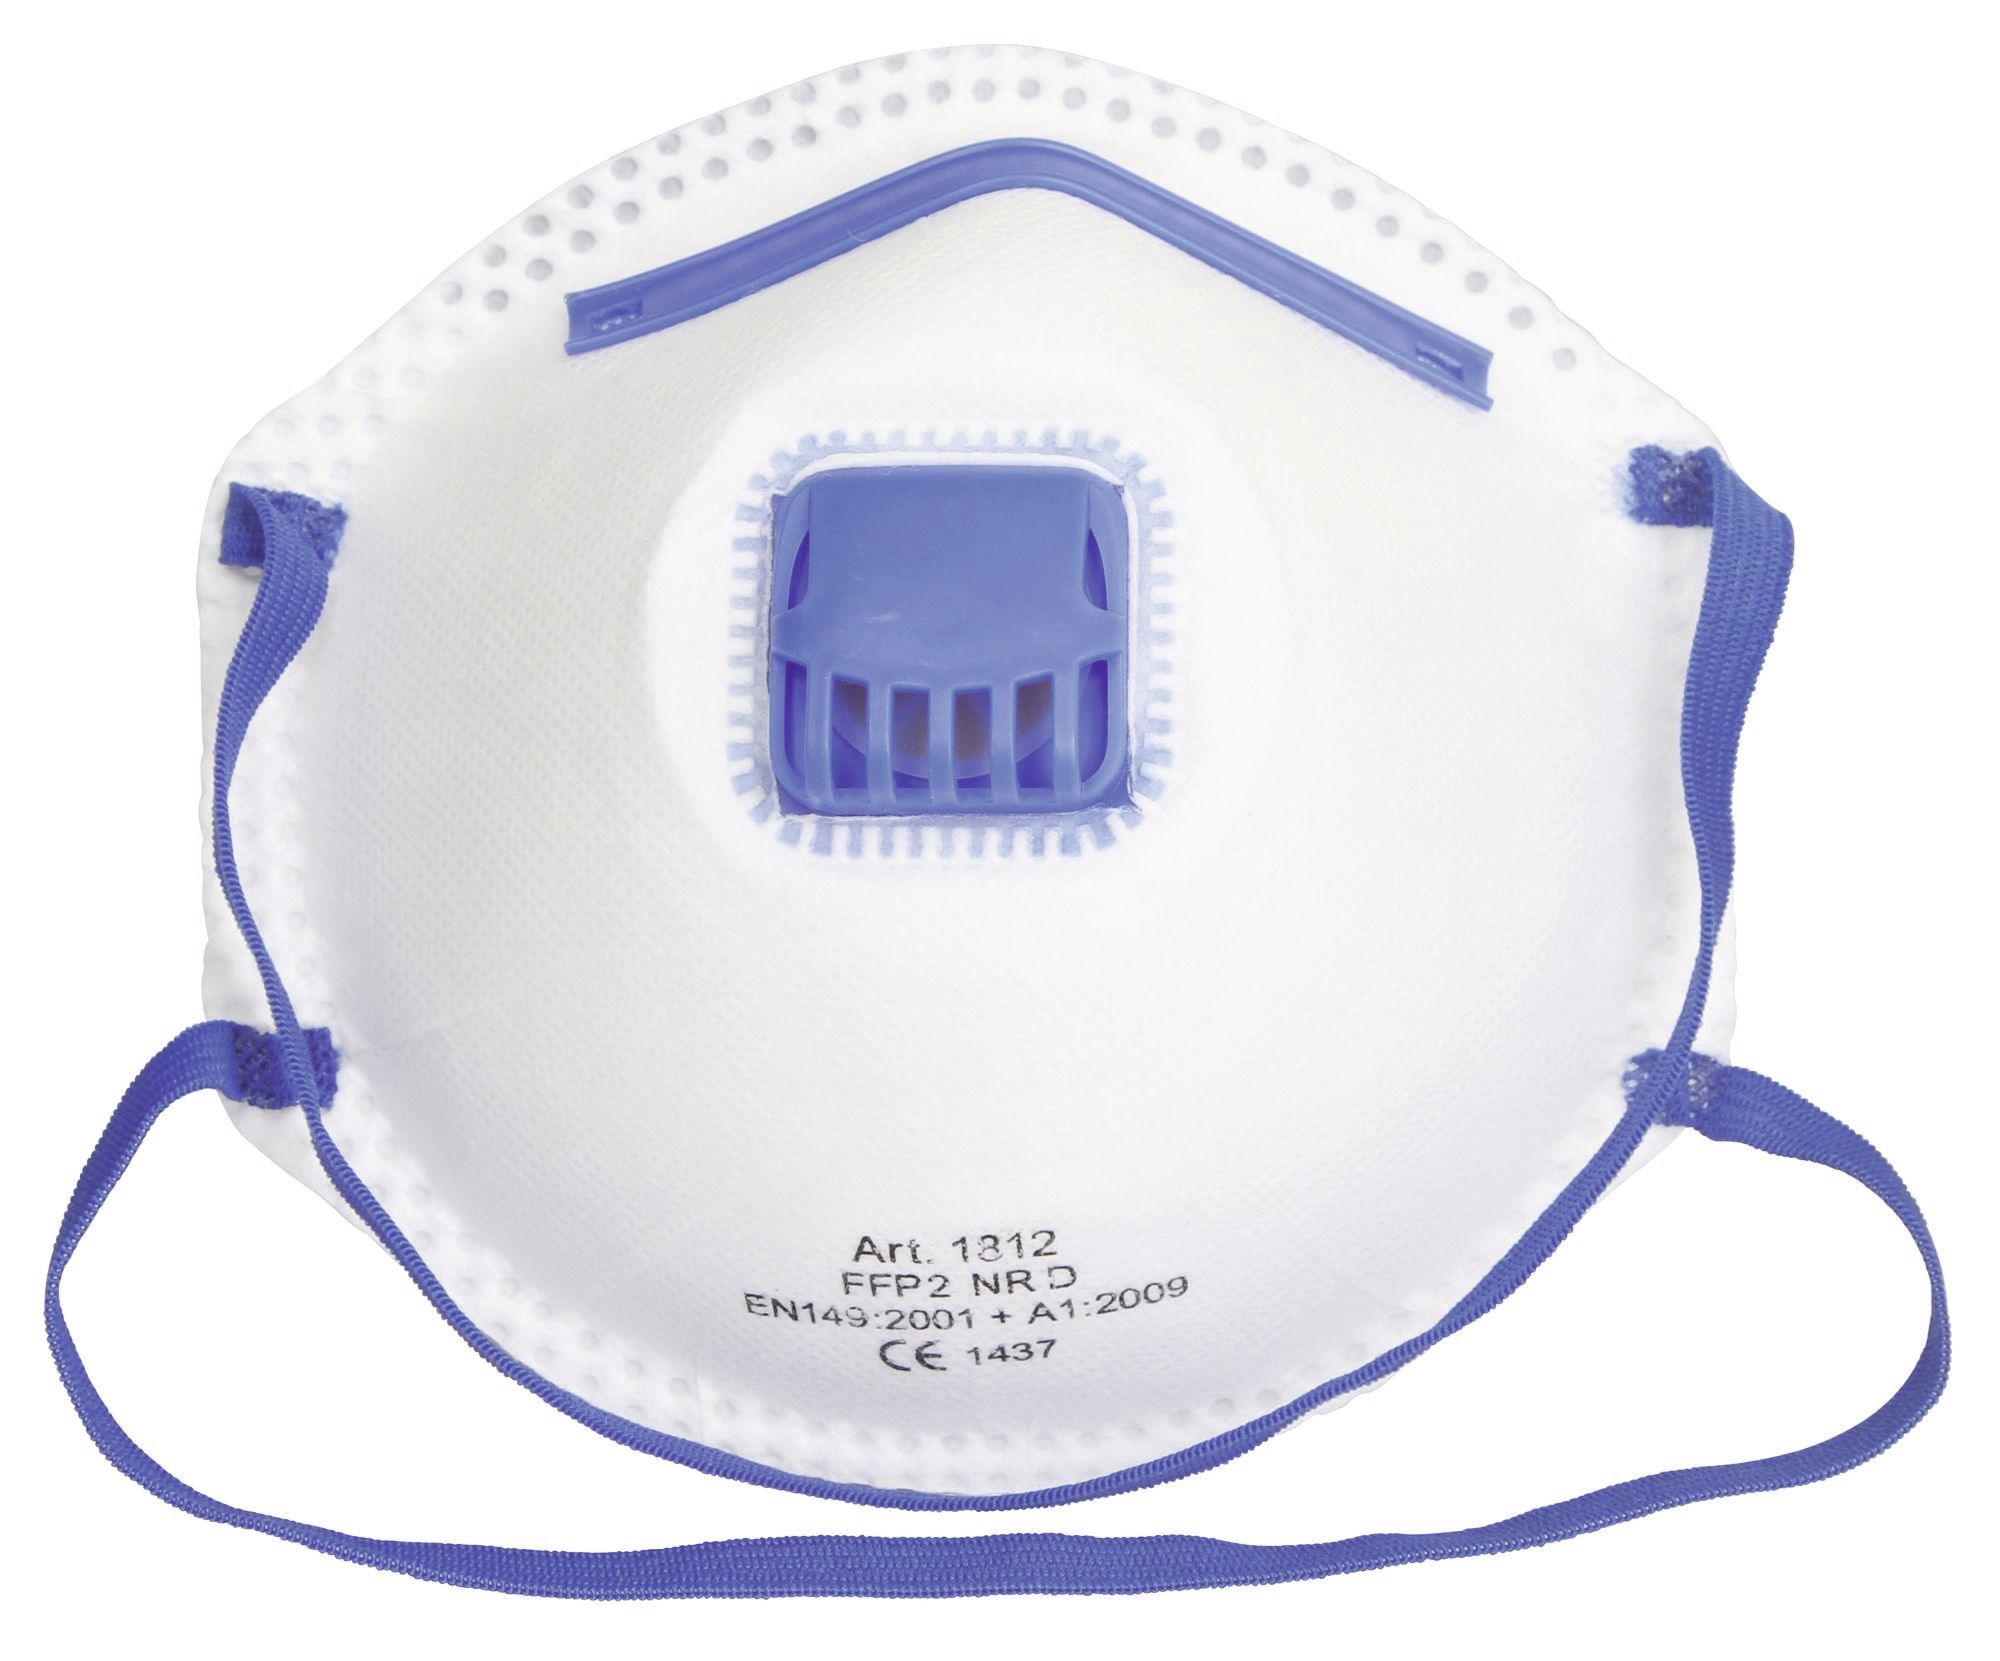 Masca protectie FFP2 NR D Kerbl cu supapa - set 3 bucati